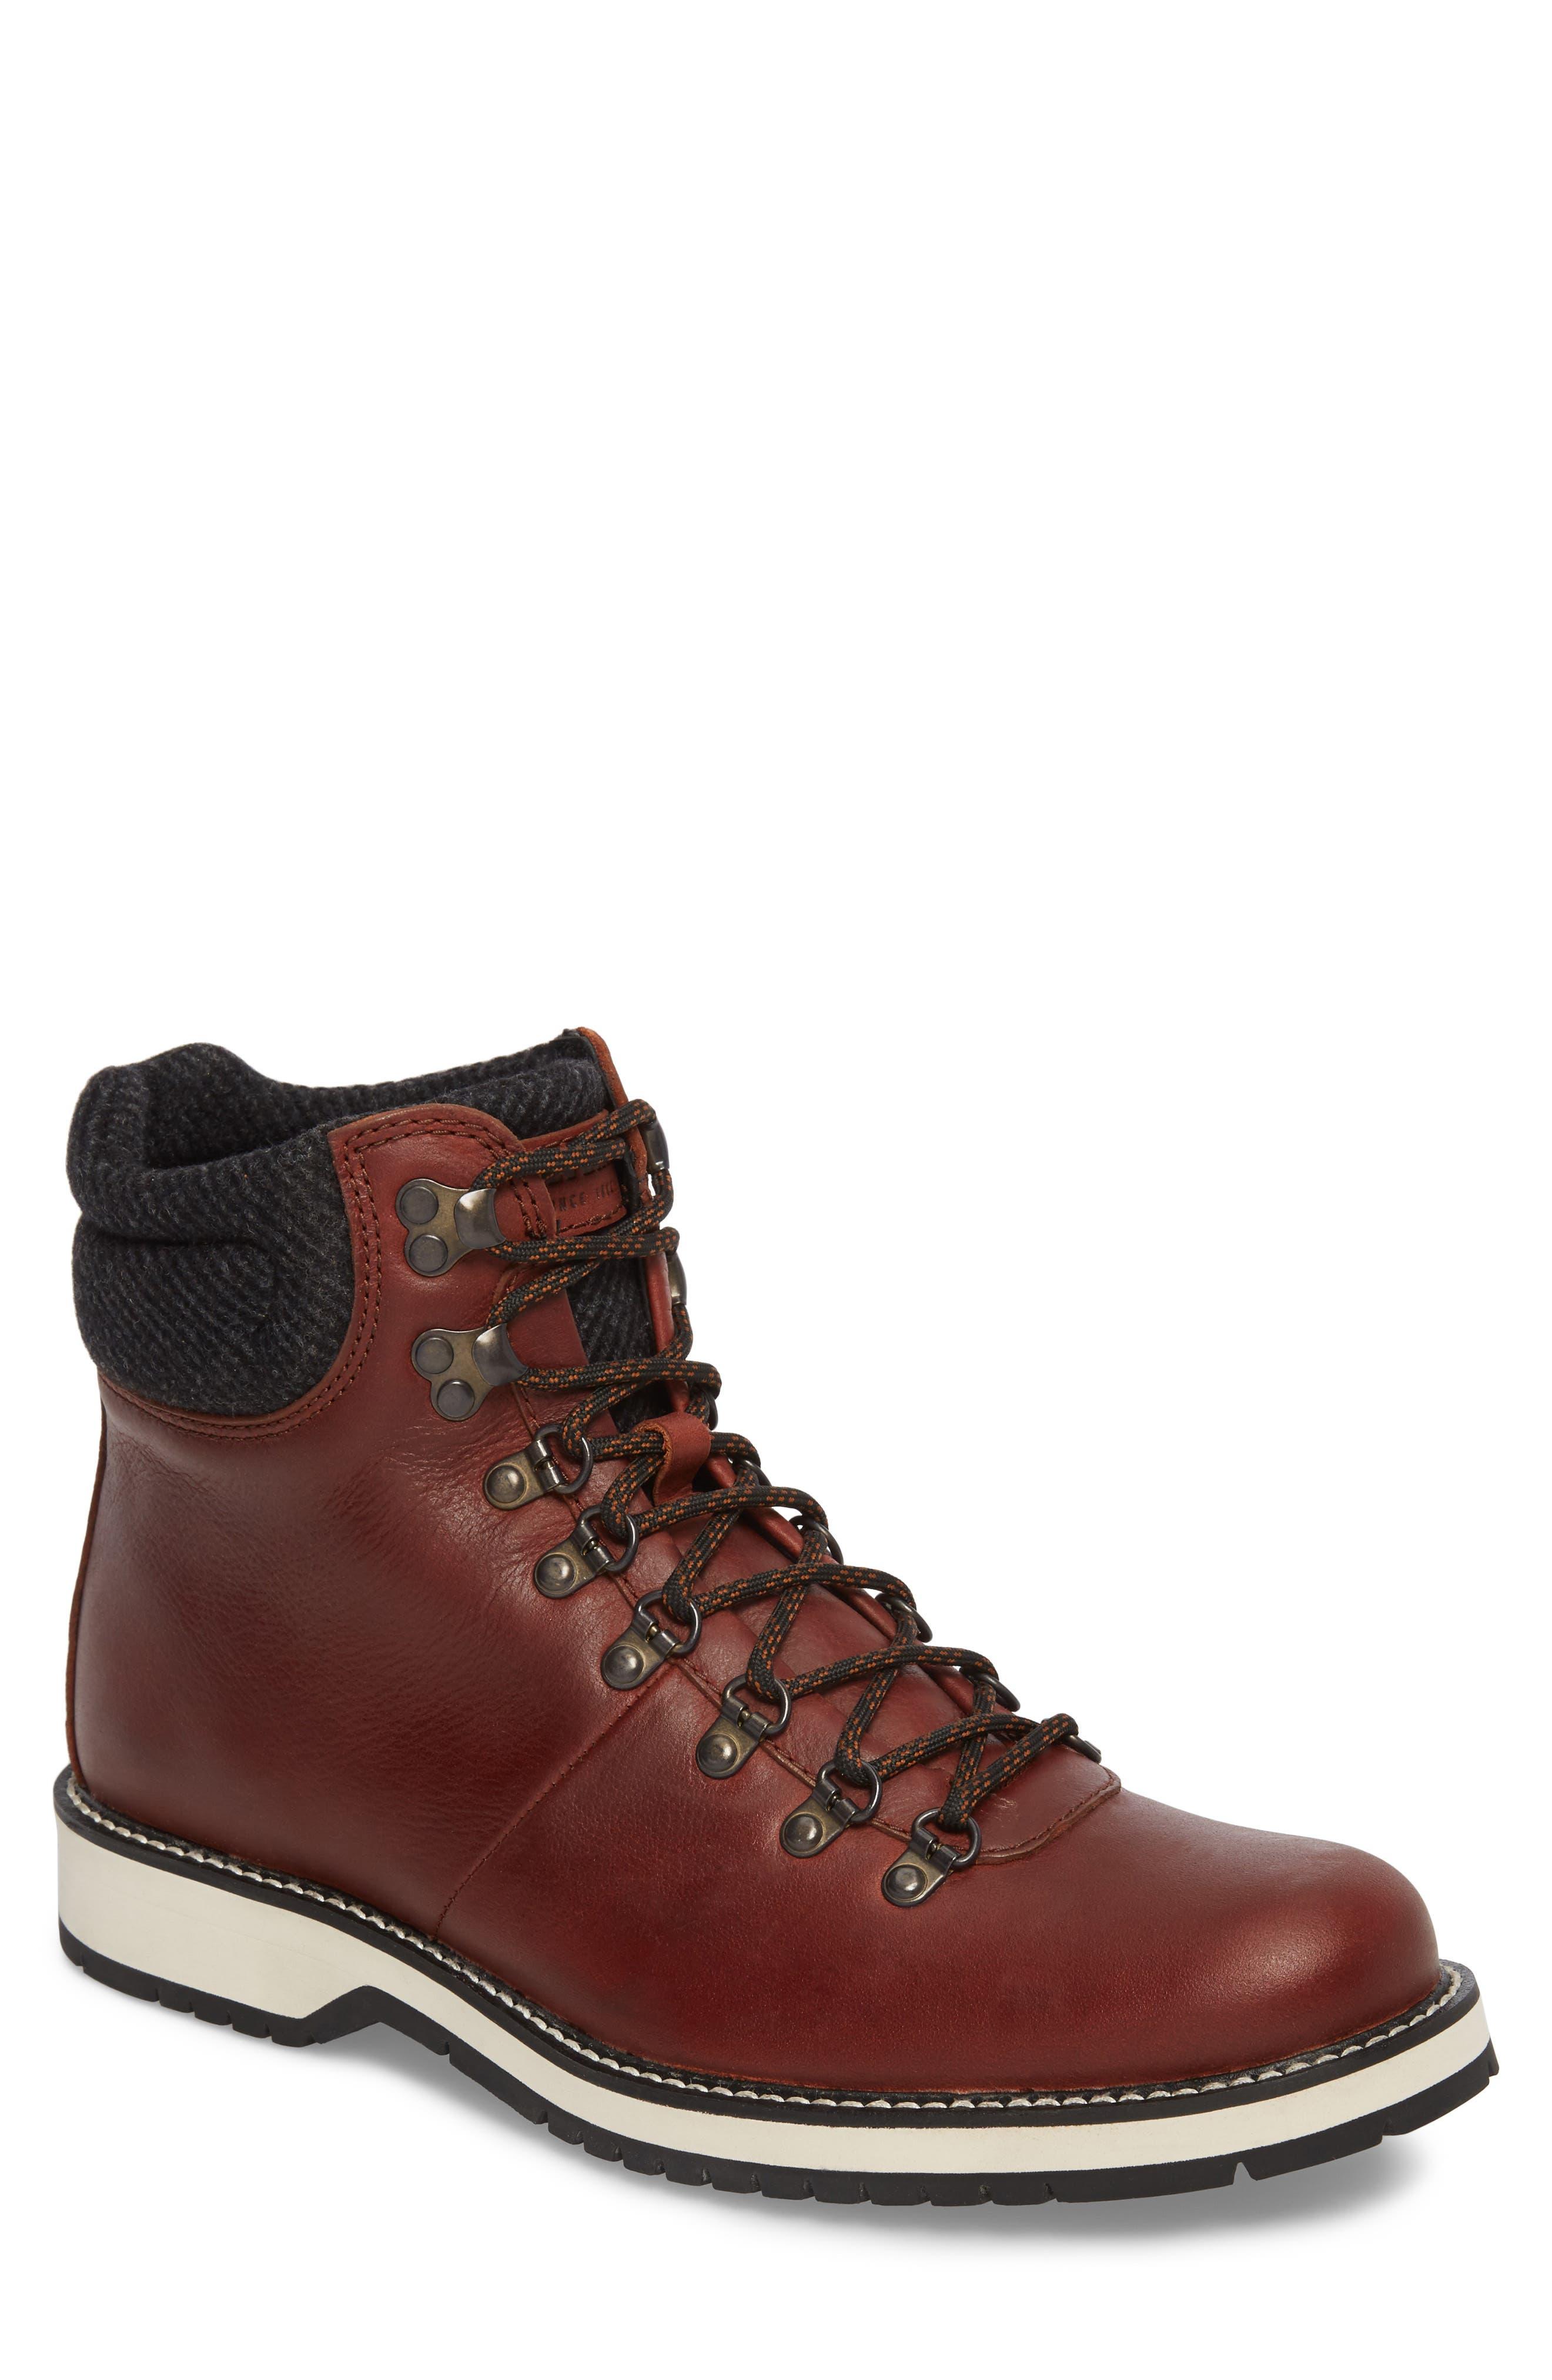 Sidney Waterproof Plain Toe Boot,                         Main,                         color, Brown